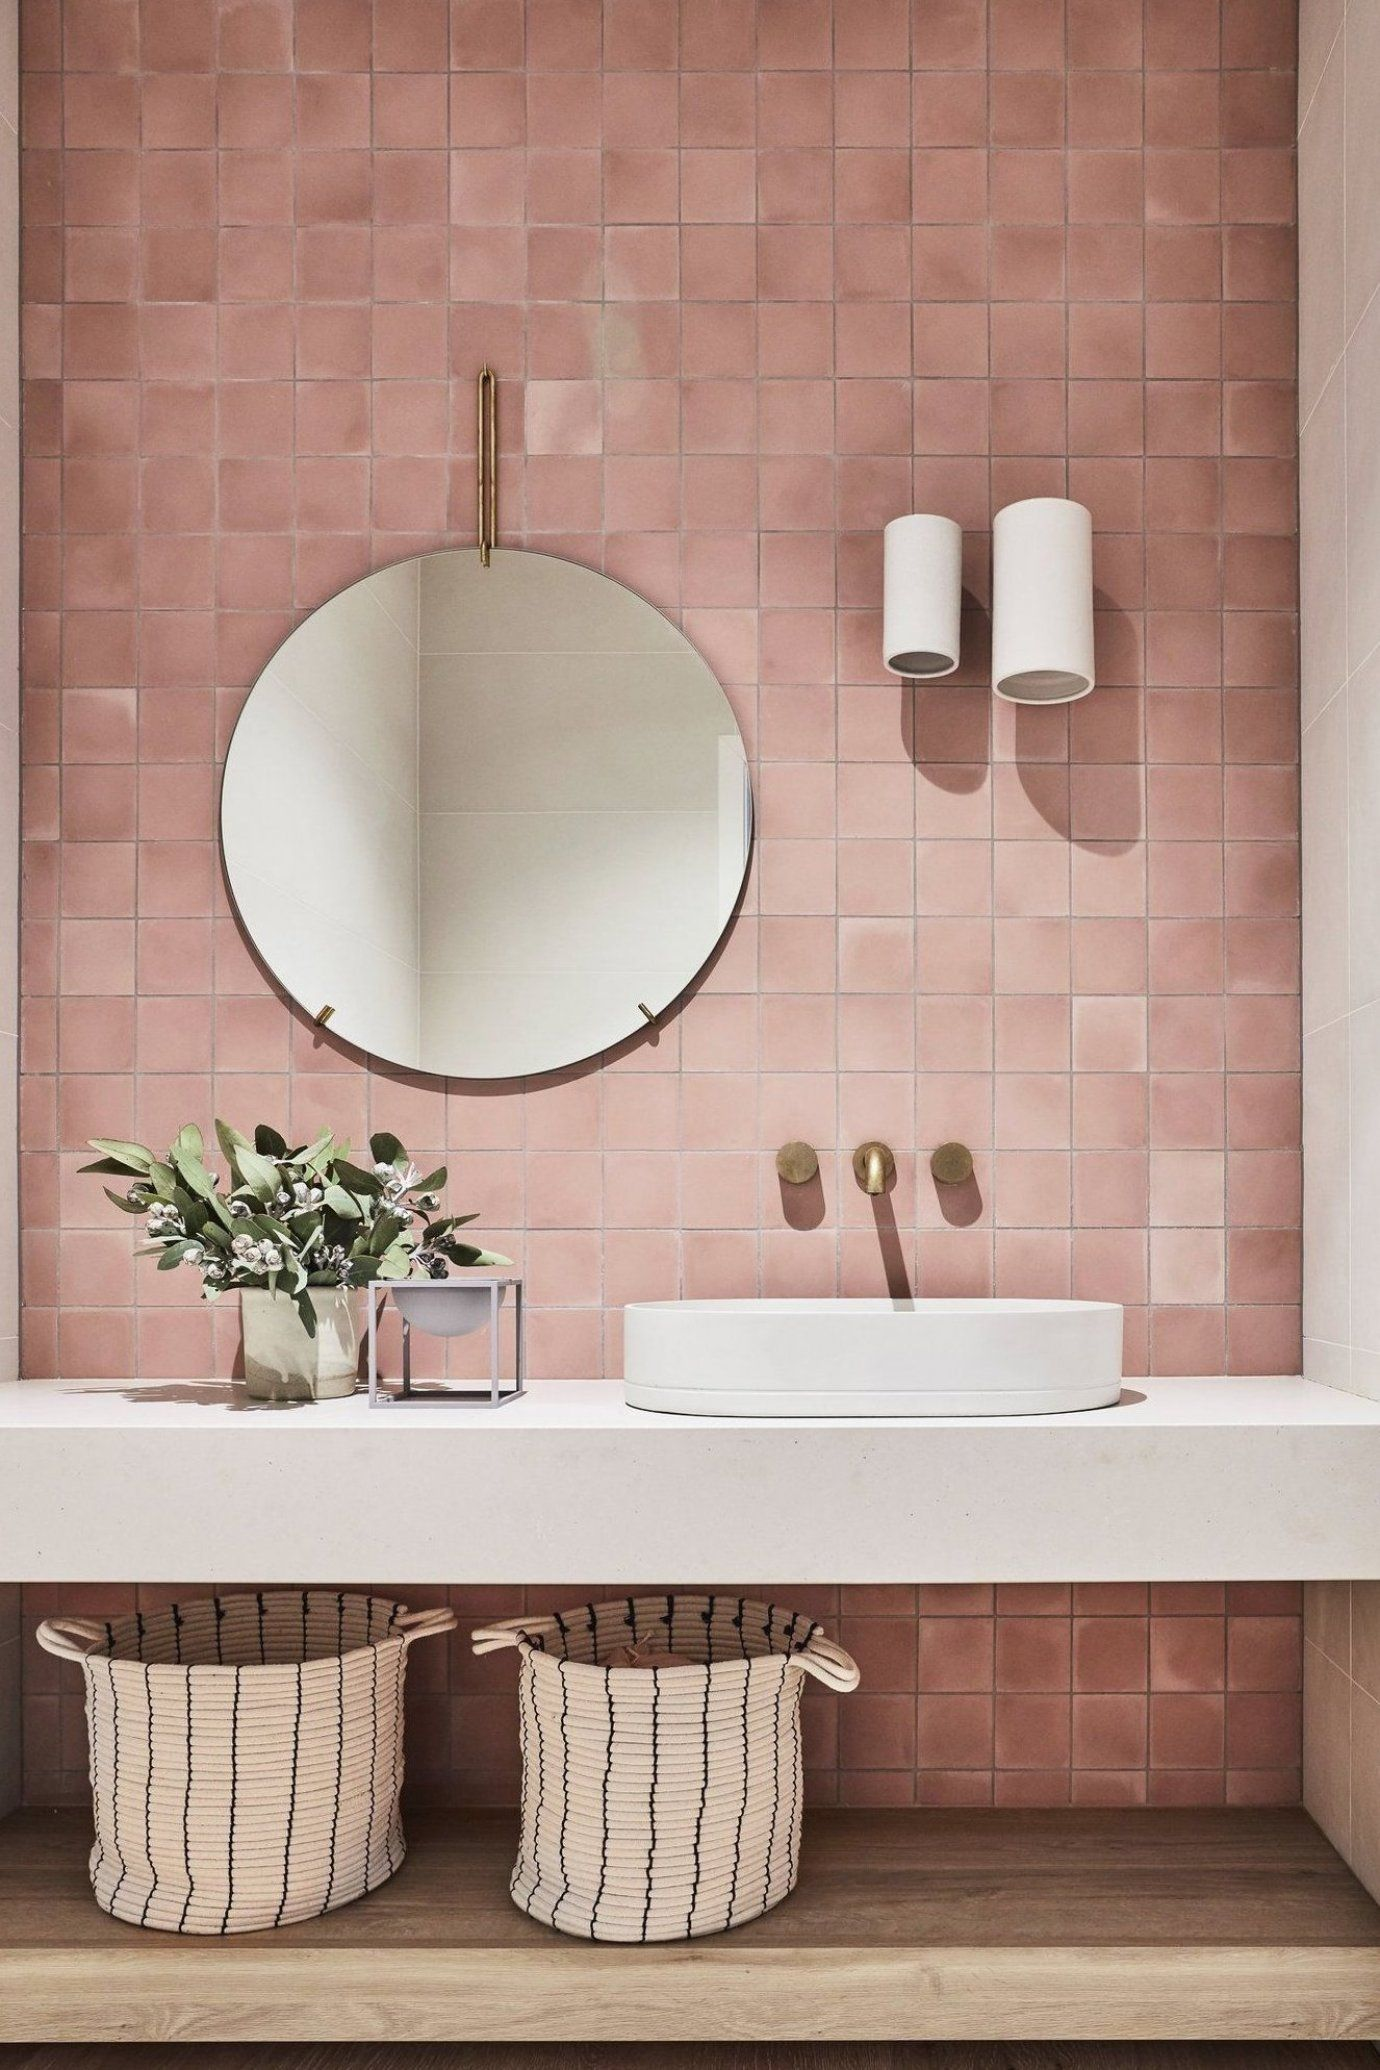 Home Decor Ideas For 1 Bhk Decor Ideas With Wood Living Room Decor And Ideas Quirky Decor Ideas Roo In 2020 Bathroom Decor Luxury Bathroom Decor Diy Bathroom Decor